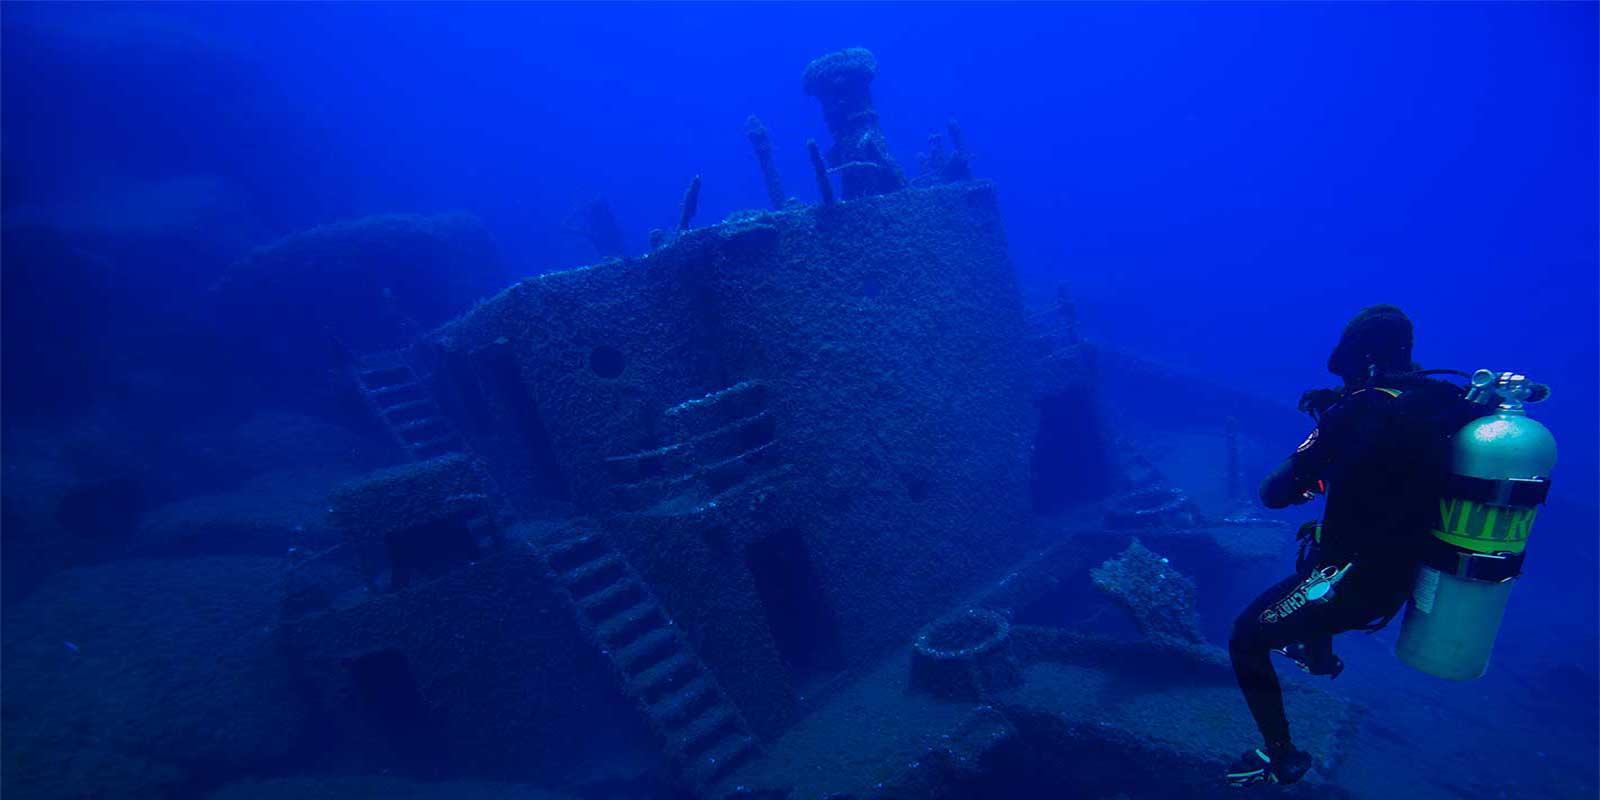 Recreational dives blu dive center santa teresa gallura sardegna - Dive center blu ...